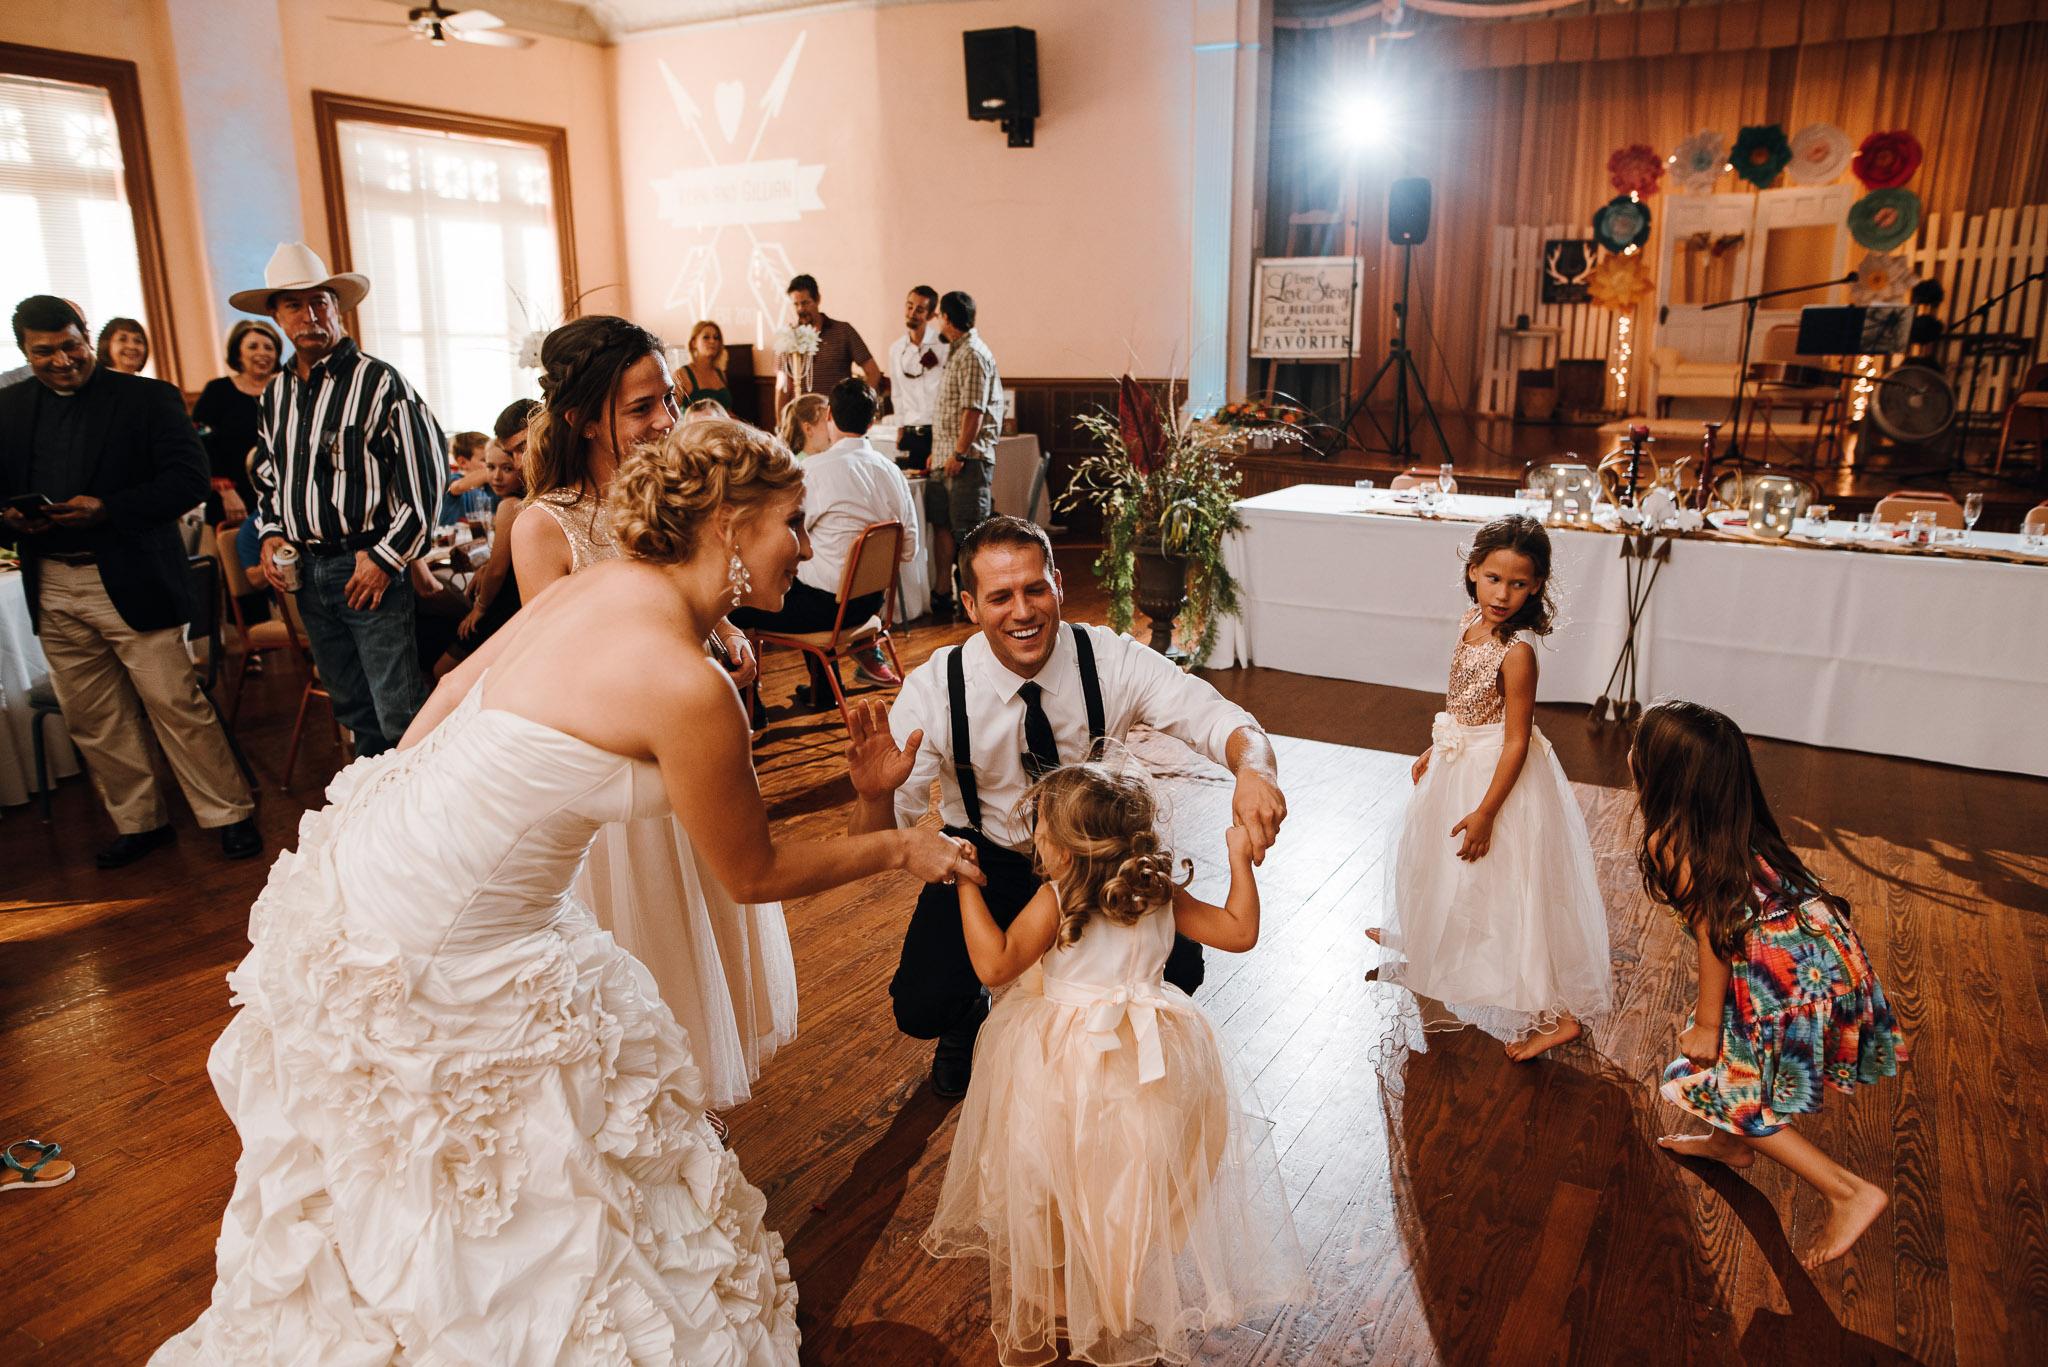 Rowena-West-Texas-Wedding-Photographer-Gillian&Ryan-0038.jpg